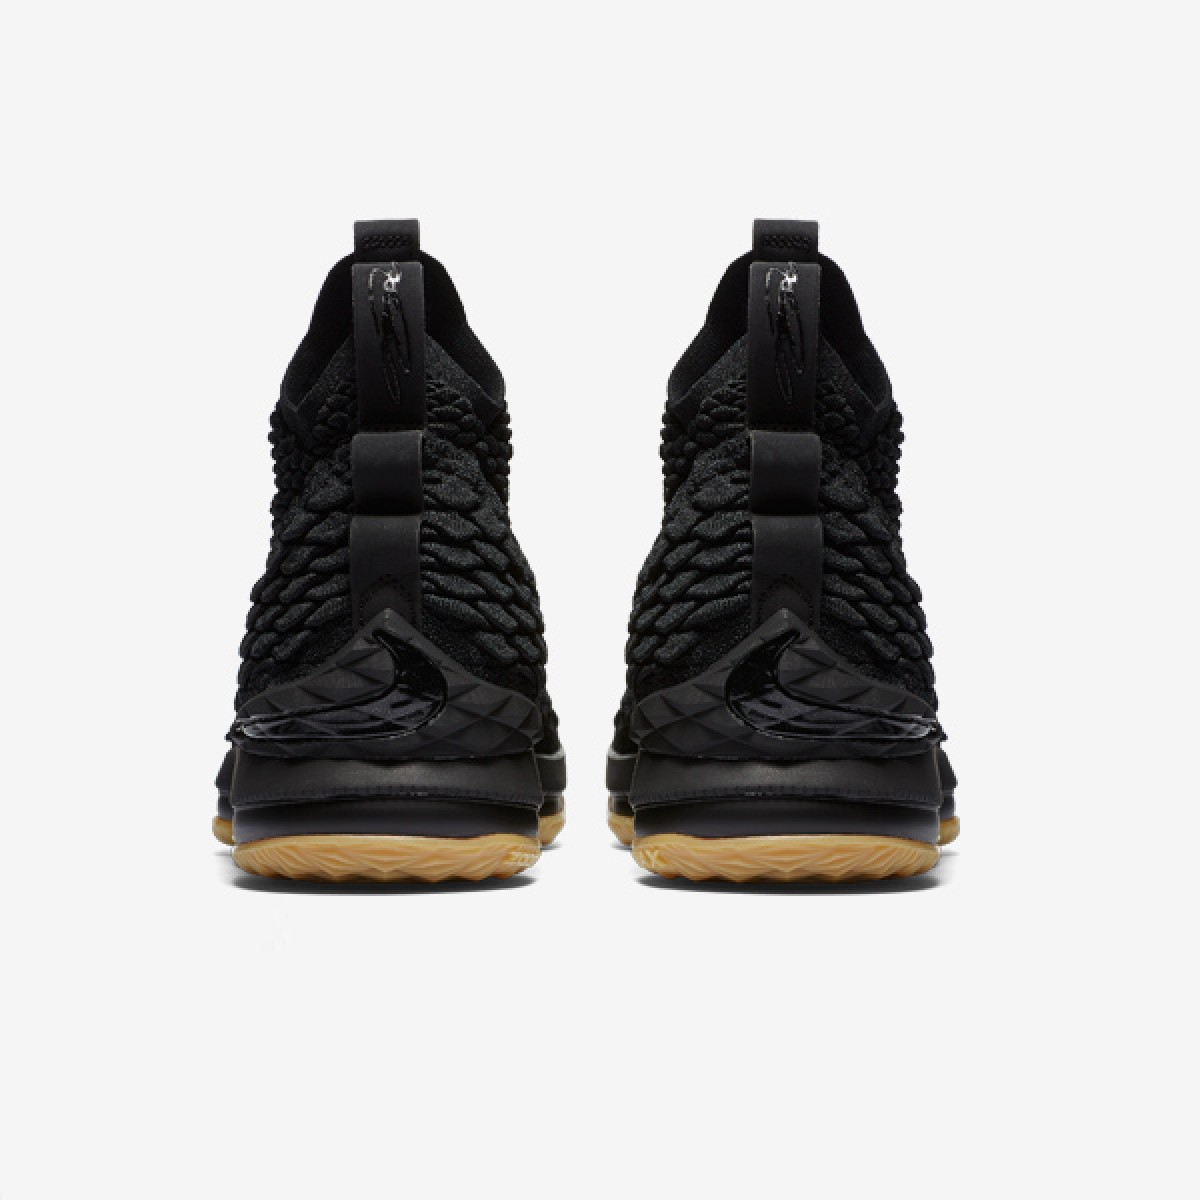 Nike Lebron XV 'Black gum' 897648-001